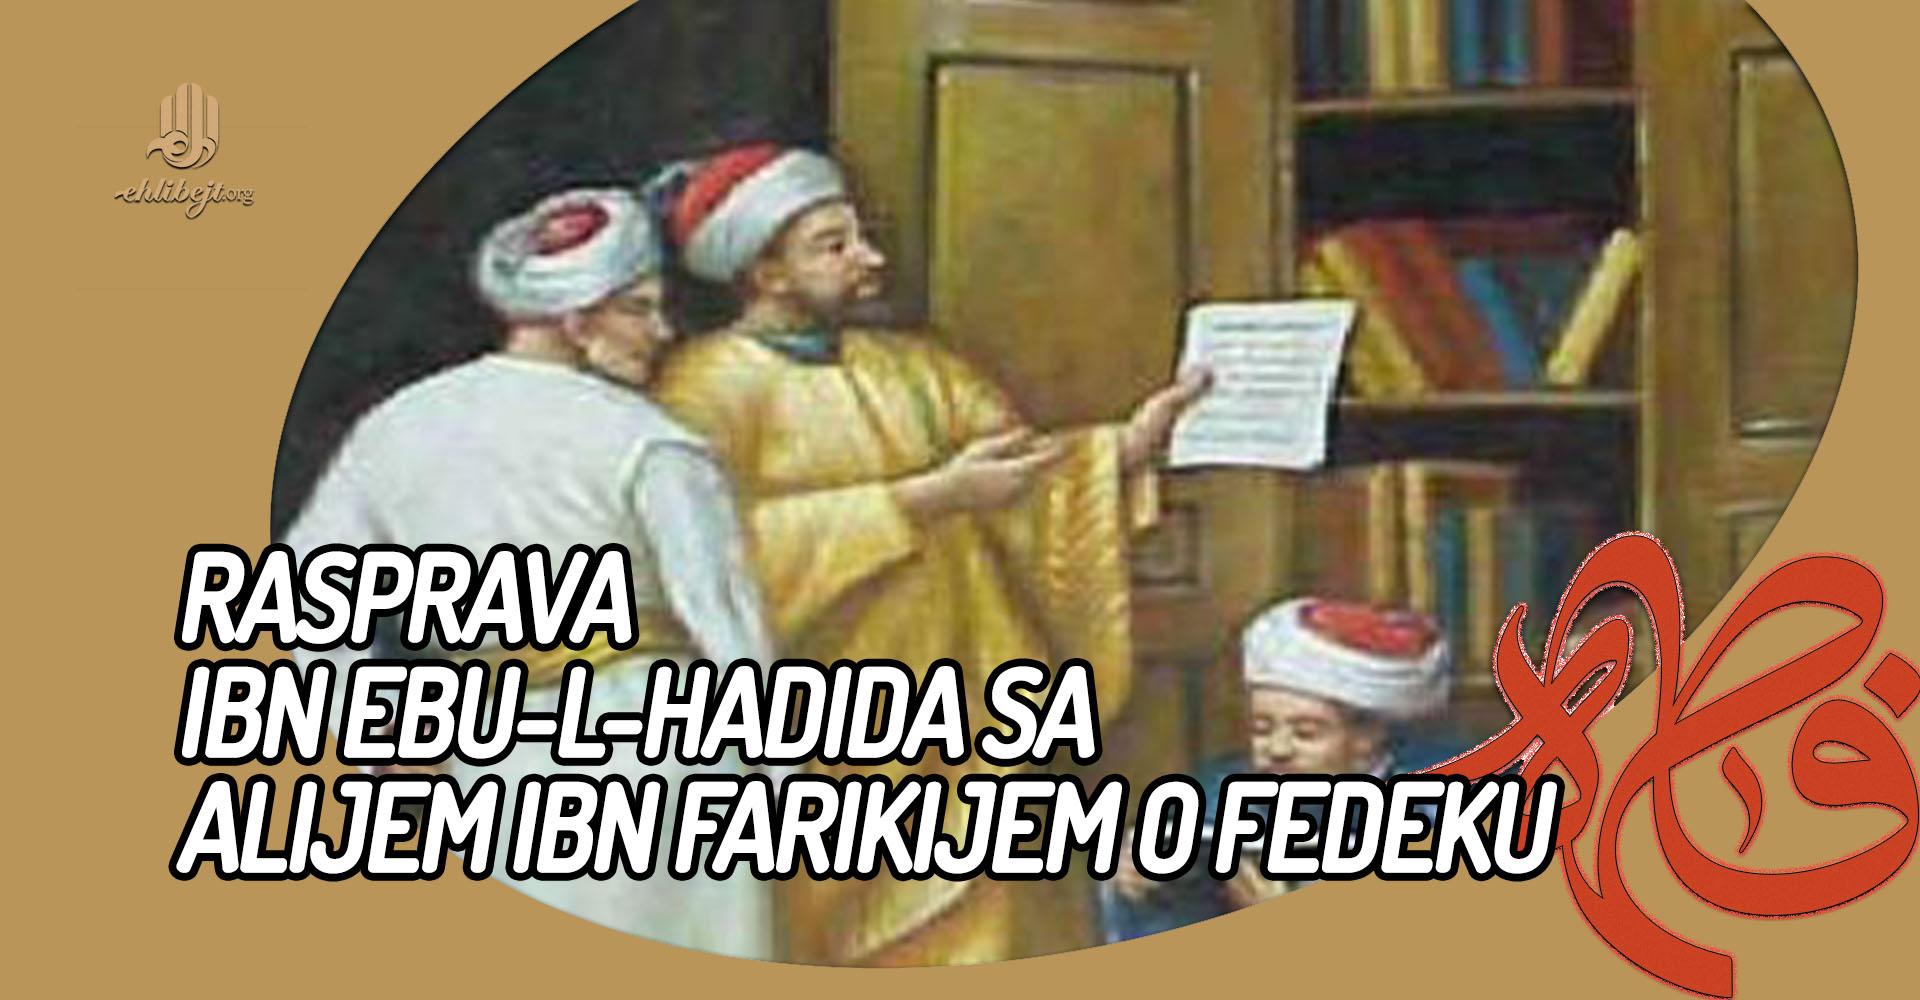 Rasprava Ibn Ebu-l-Hadida sa Alijem ibn Farikijem o Fedeku